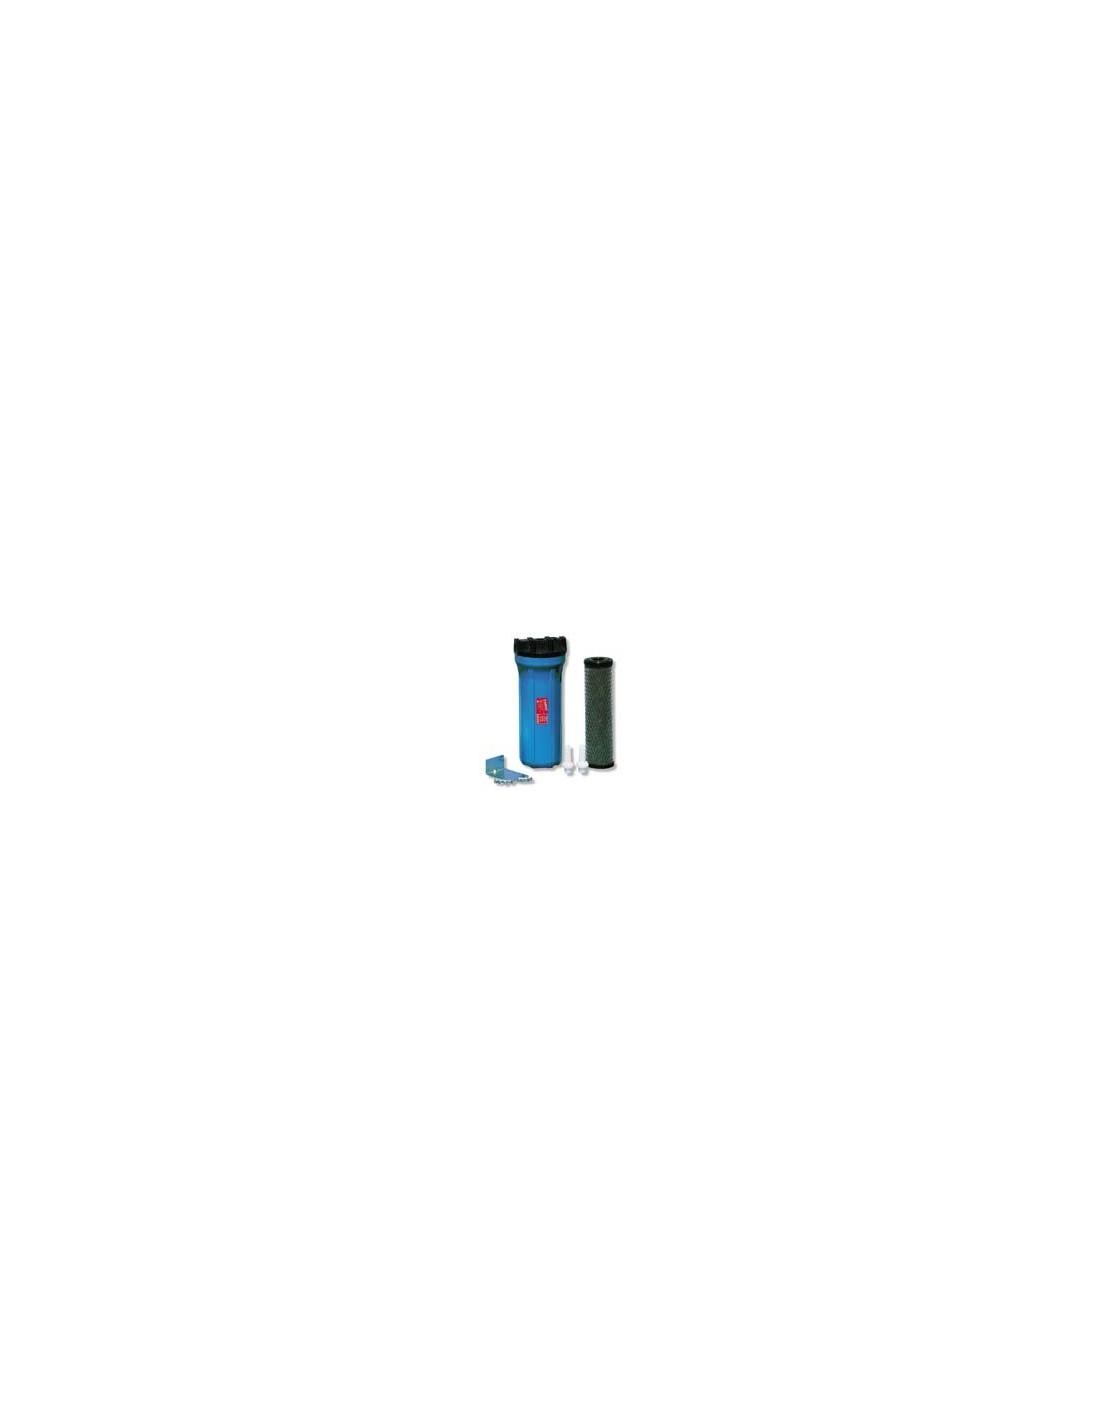 Drinkwater Filter Set - Groot - Aansluiting 13 mm - Yachticon - Onderhoud - 01.0722.00